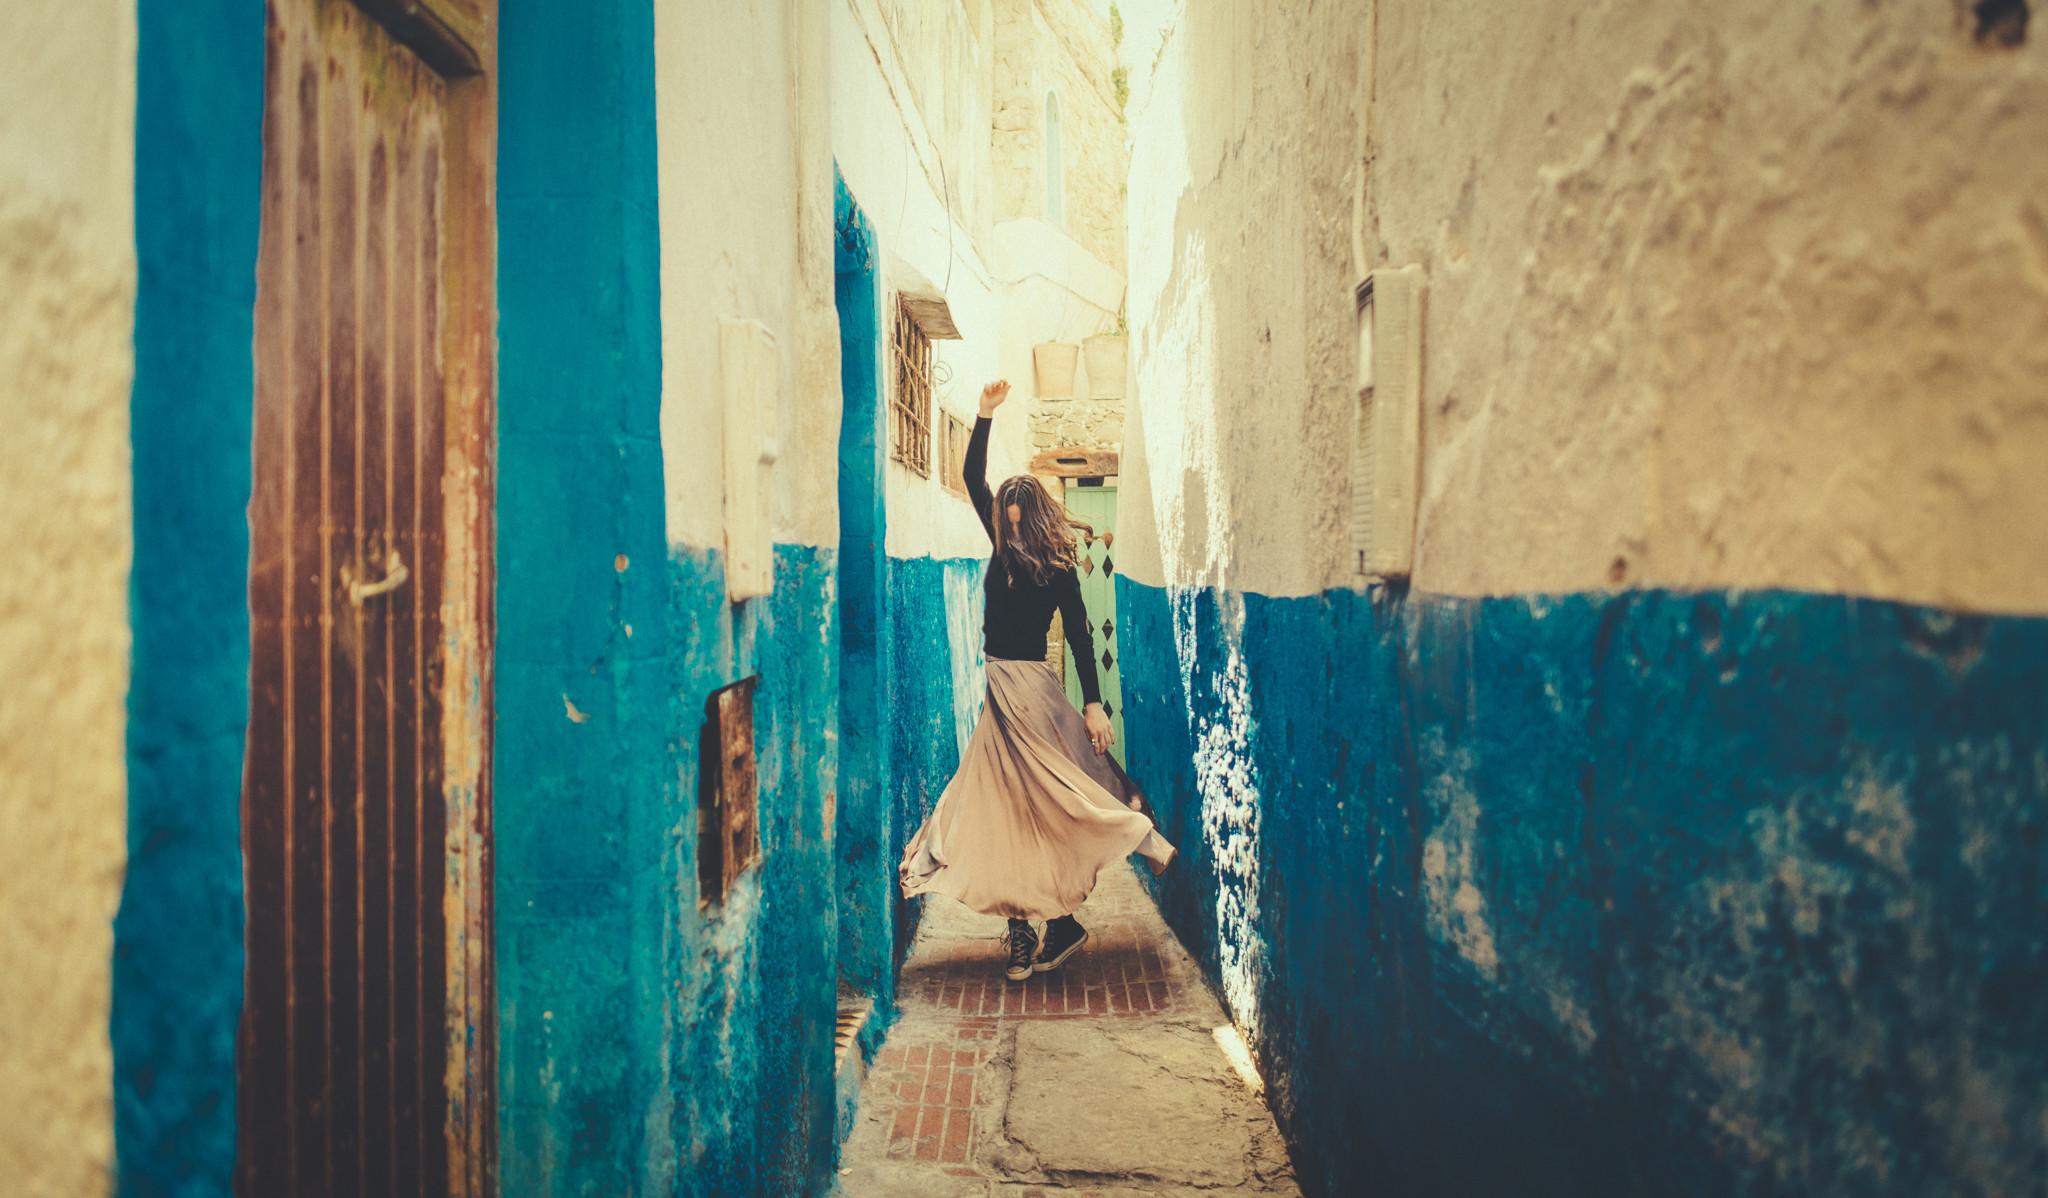 Luca Zizioli Fotografo Freelance - Reportage ad Essaouira, Marocco